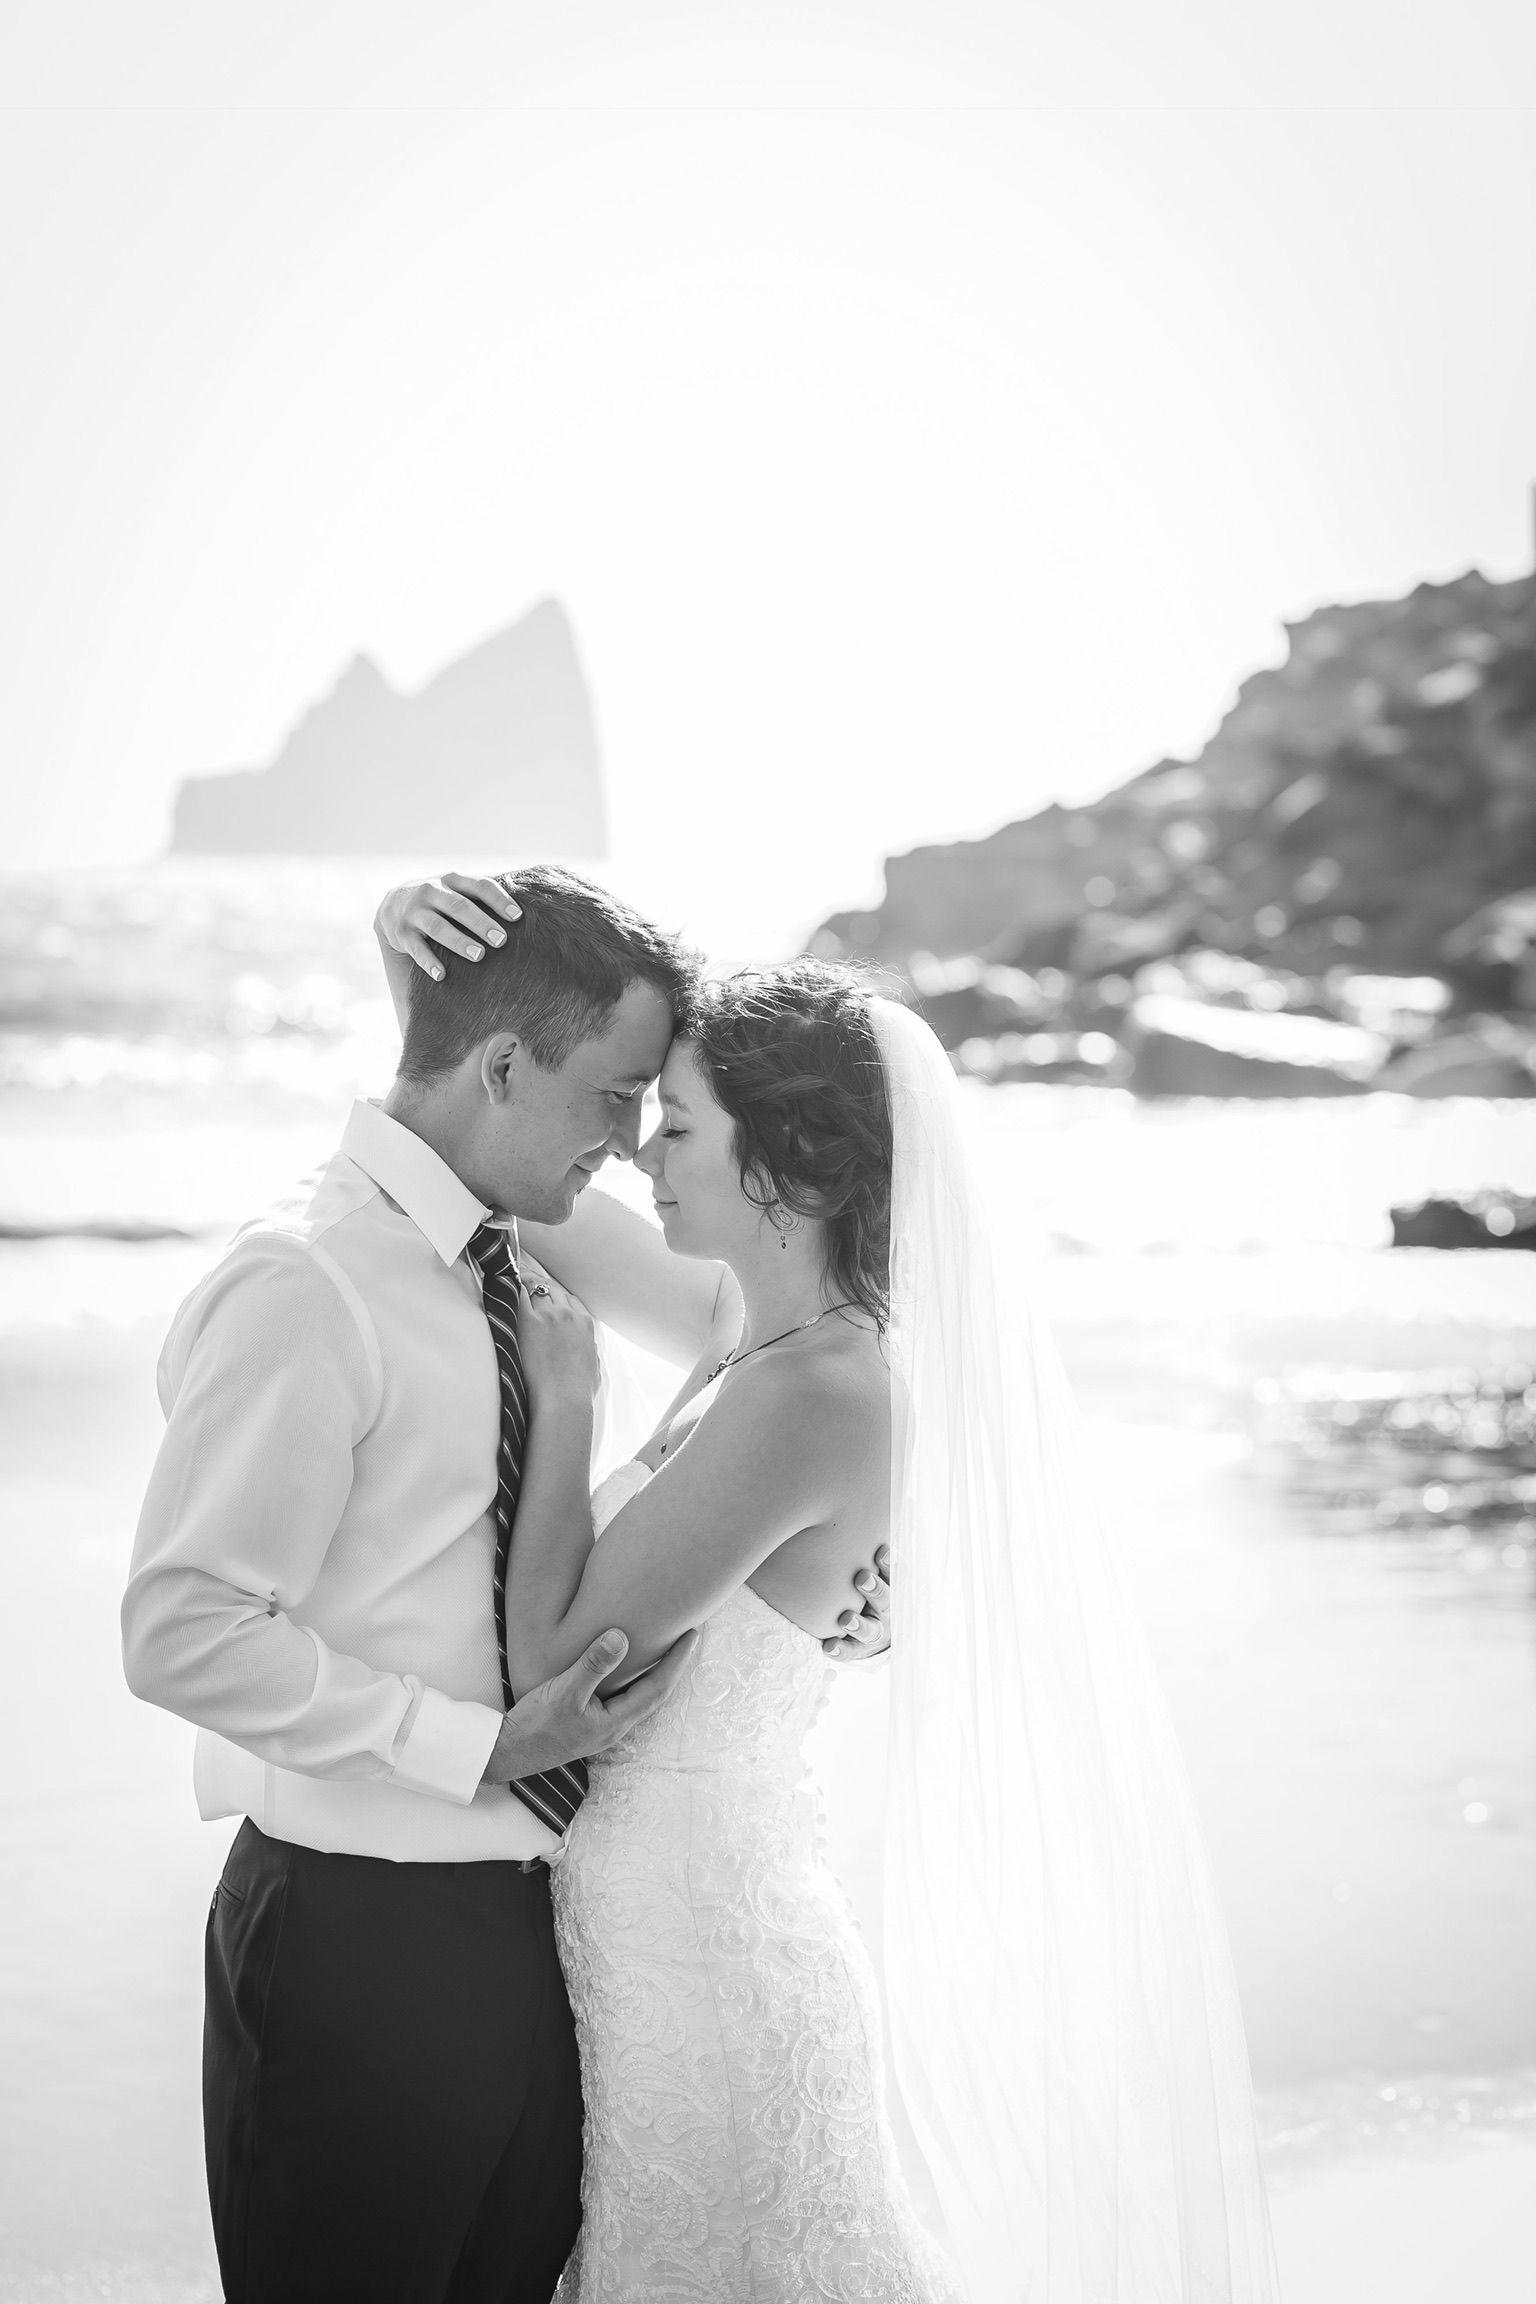 Burnt hill beach romanic weddings private beach on the